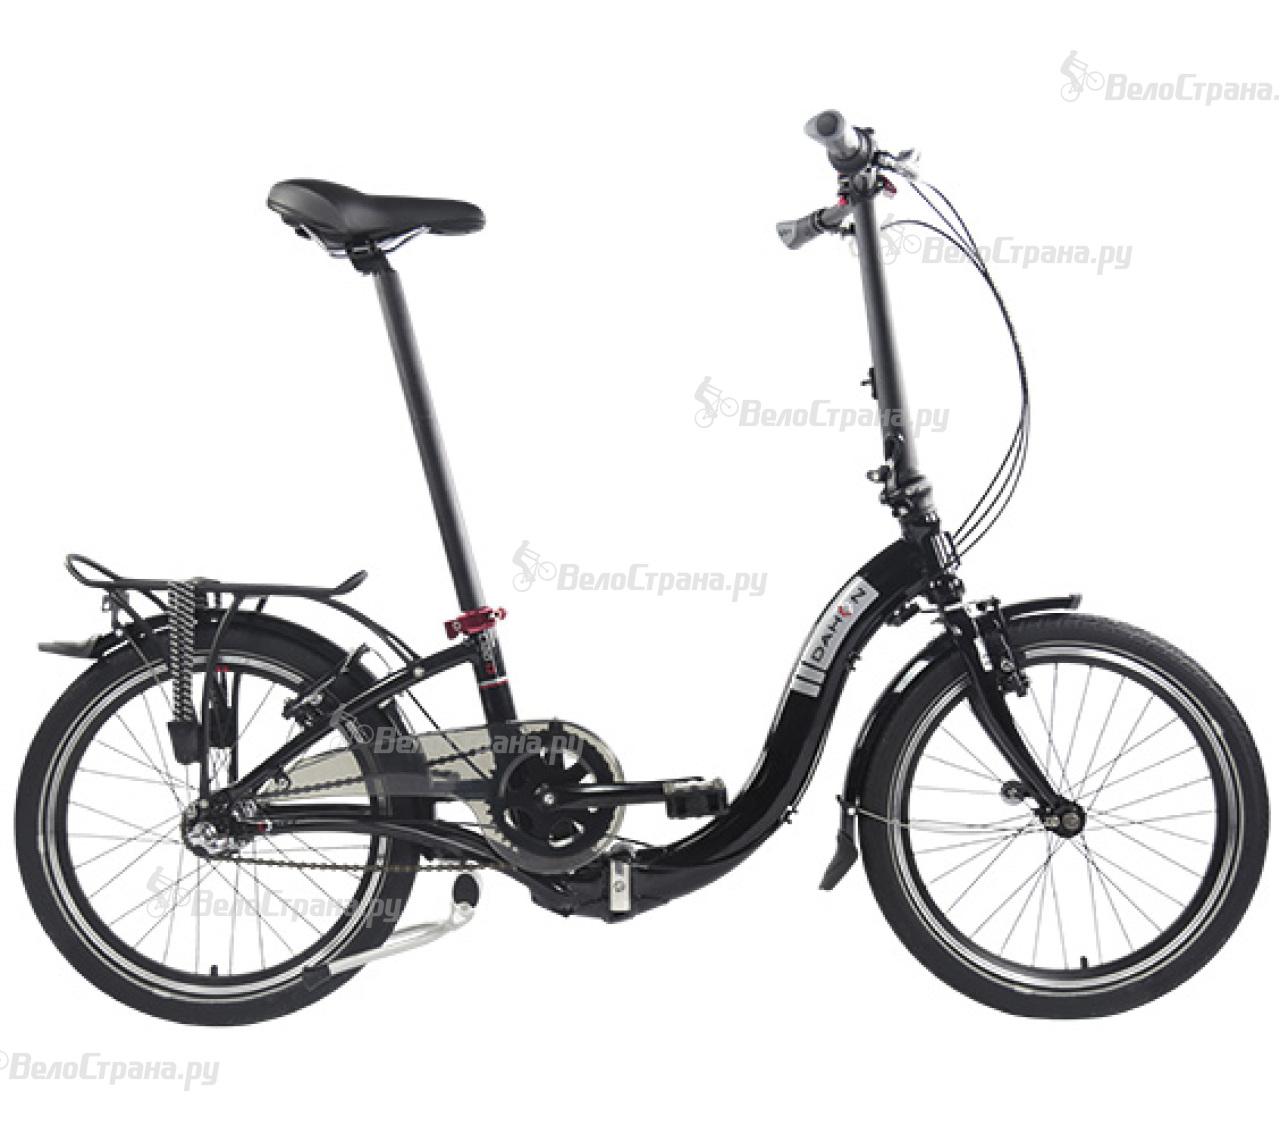 Велосипед Dahon Ciao i3 (2017) велосипед dahon vybe d7 u 2017